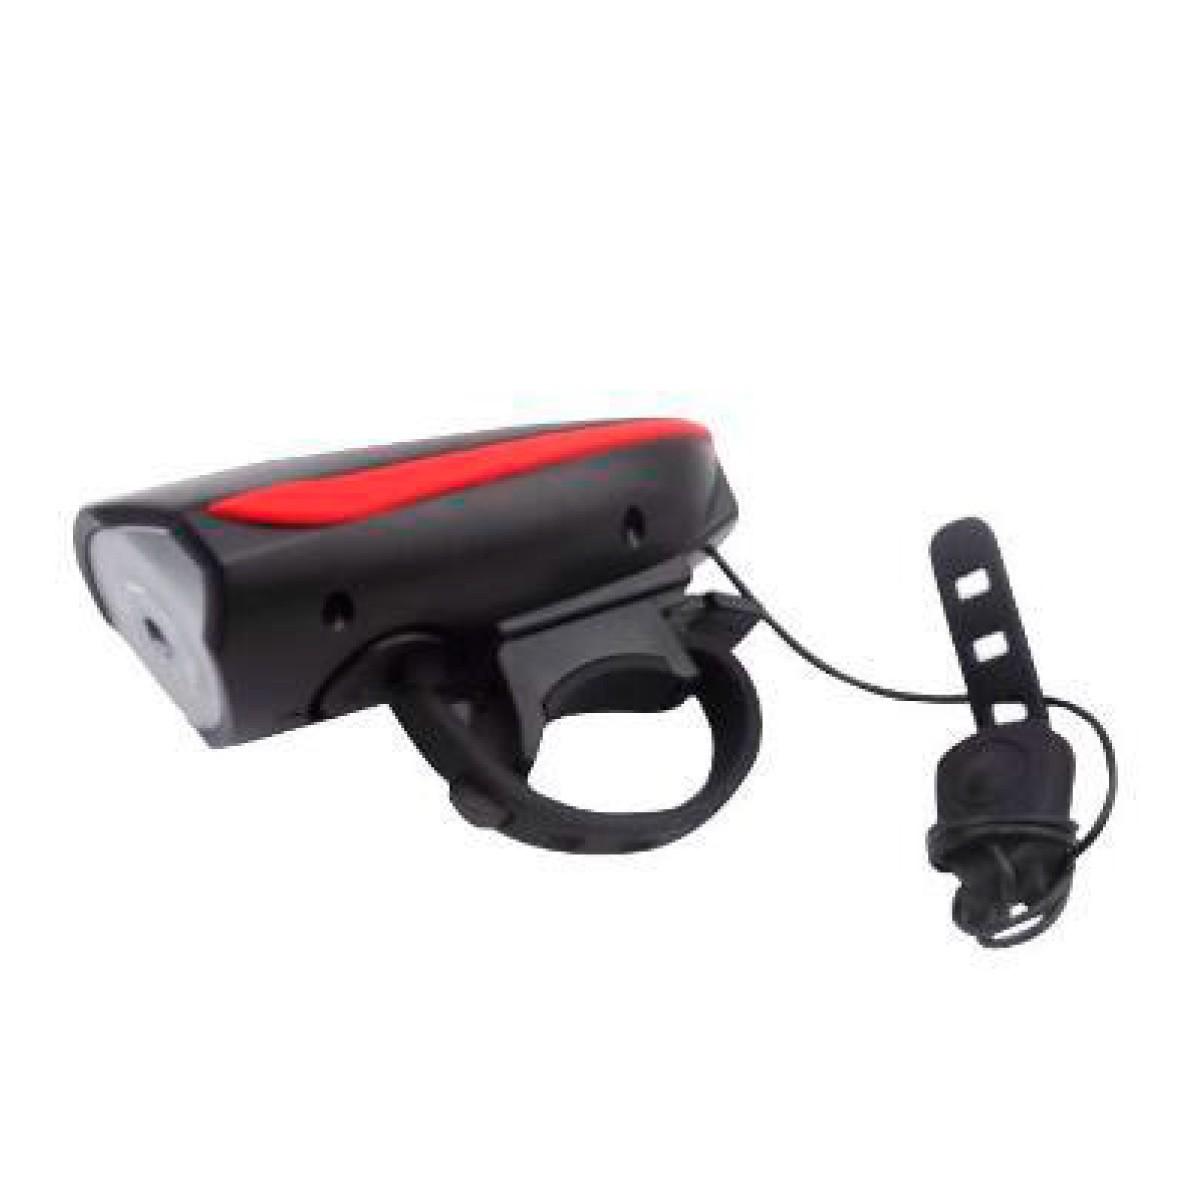 Farol USB com buzina 250 Lumes Vermelho